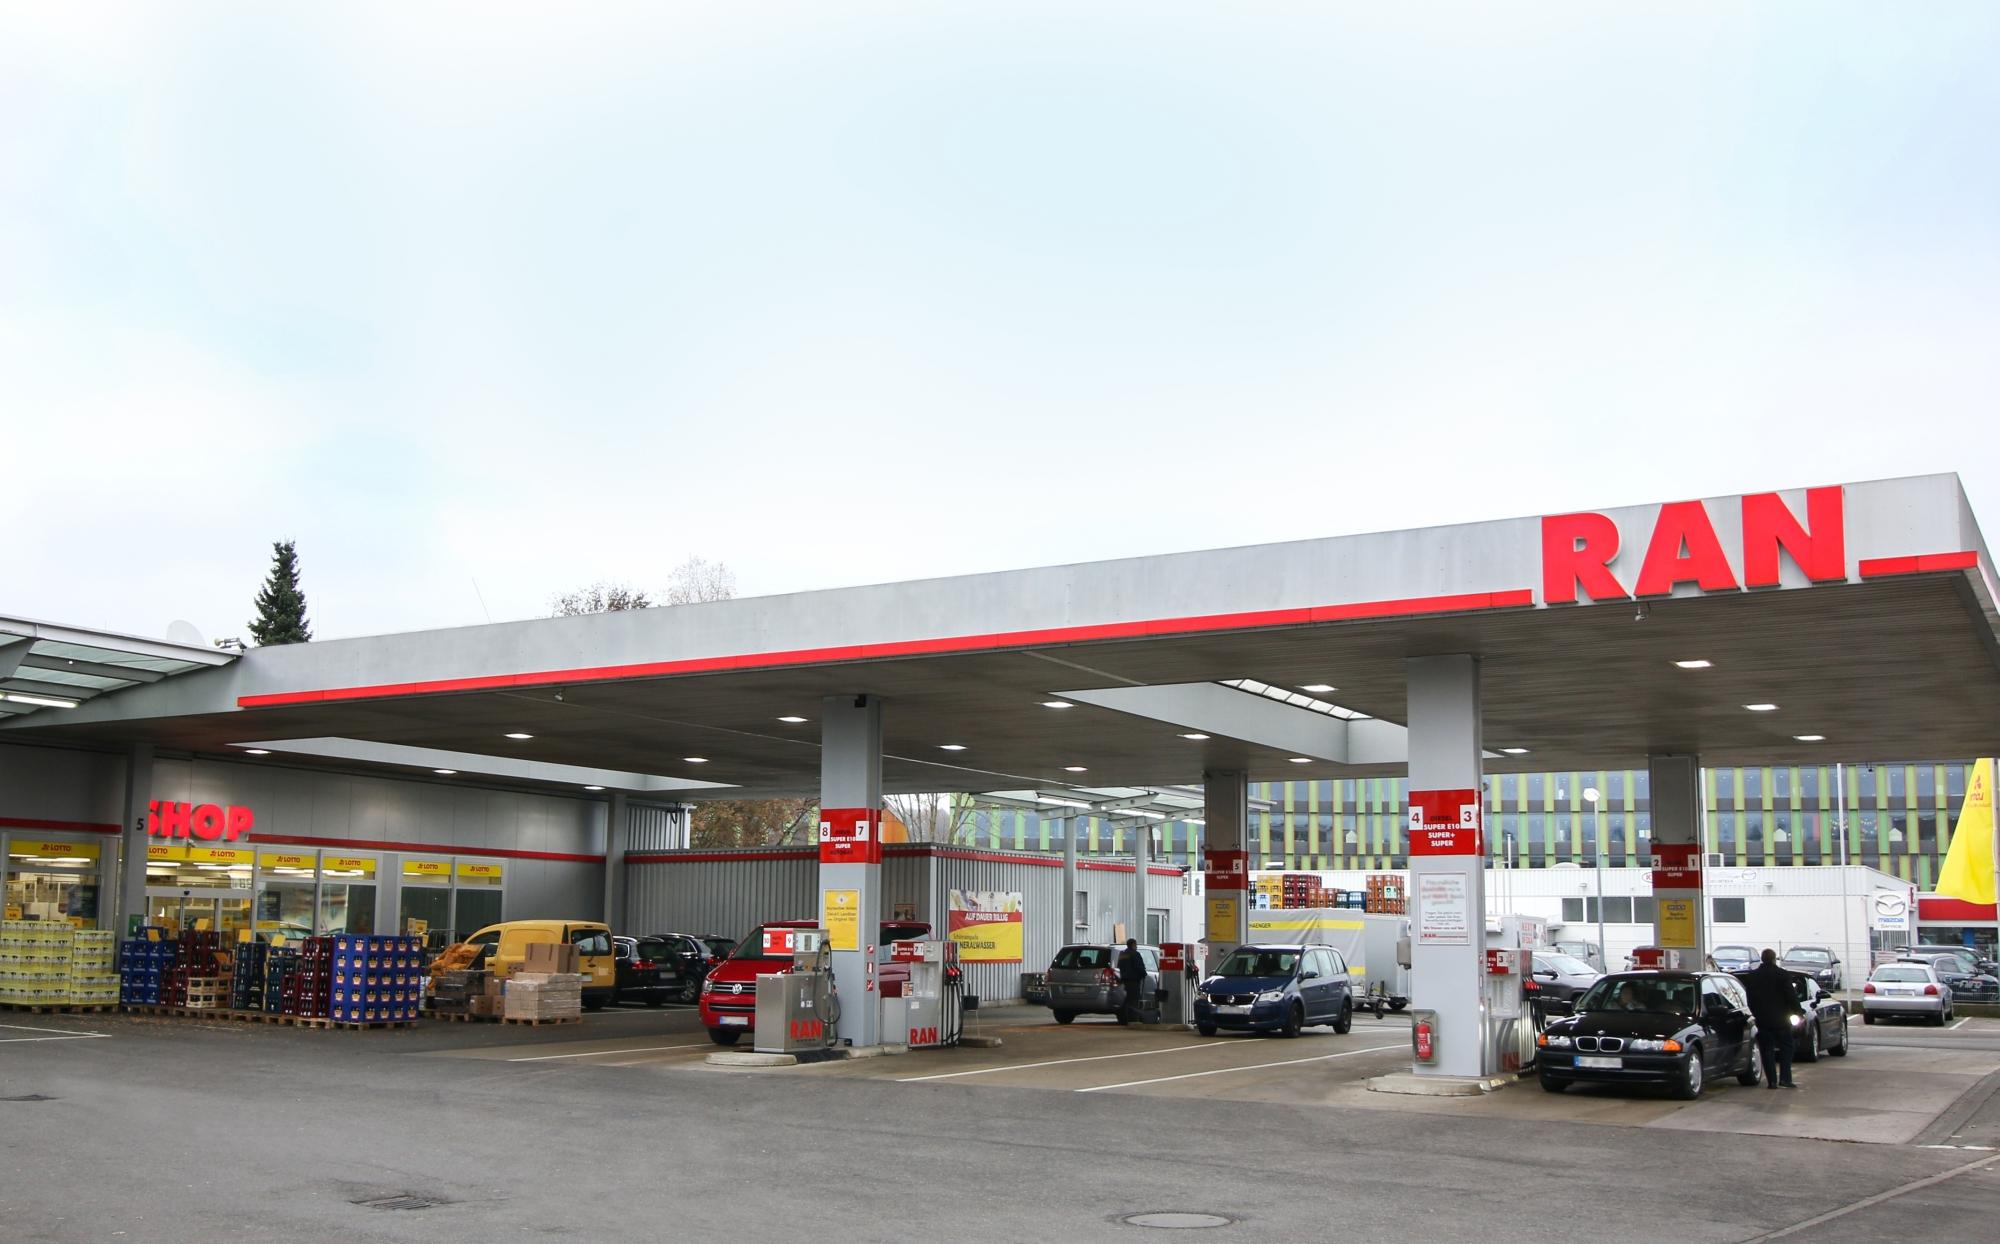 Ran Tankstelle Biberach